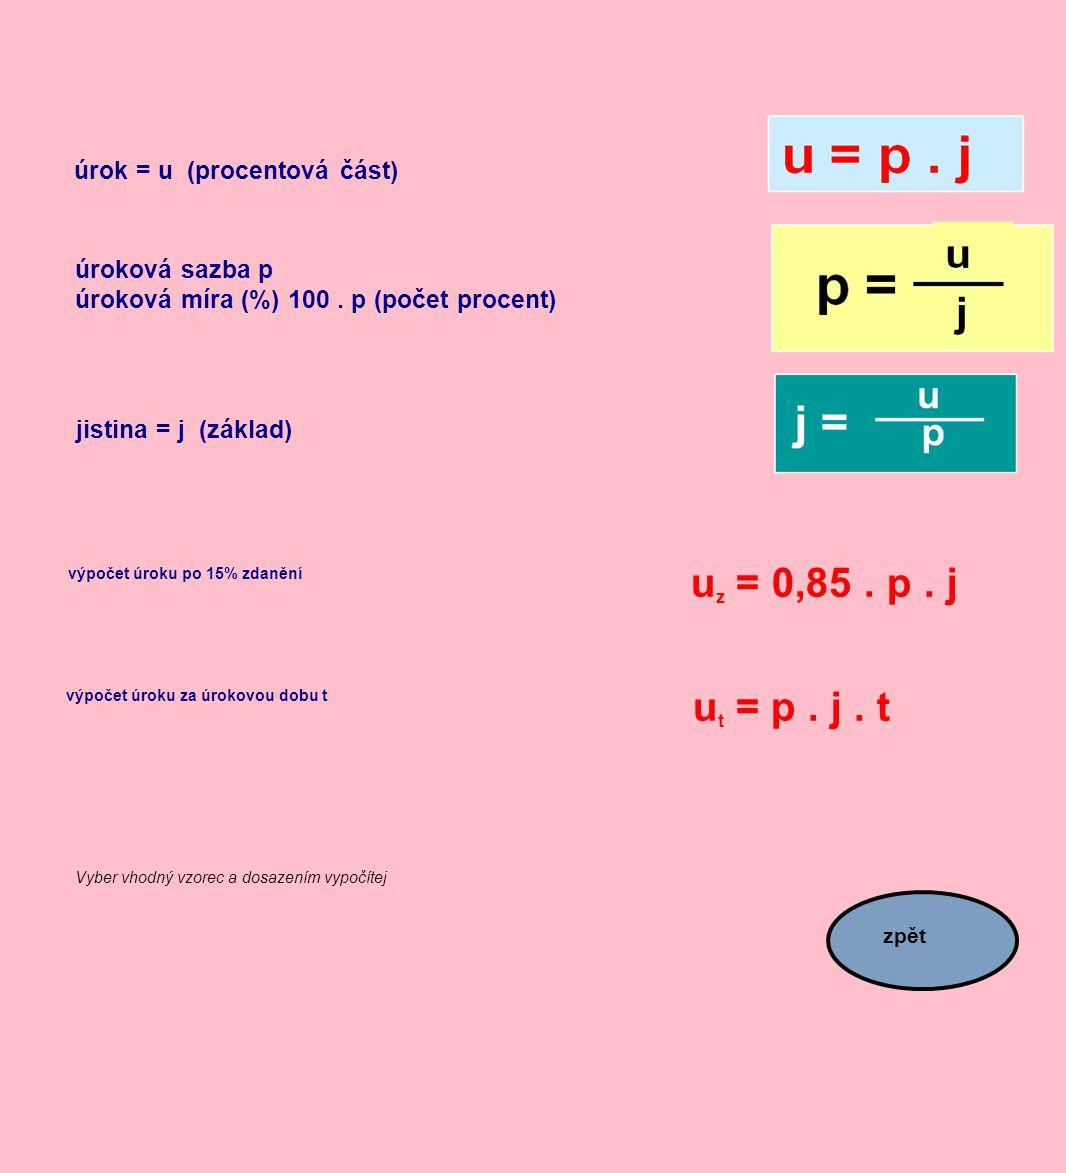 uz = 0,85 . p . j ut = p . j . t úrok = u (procentová část)